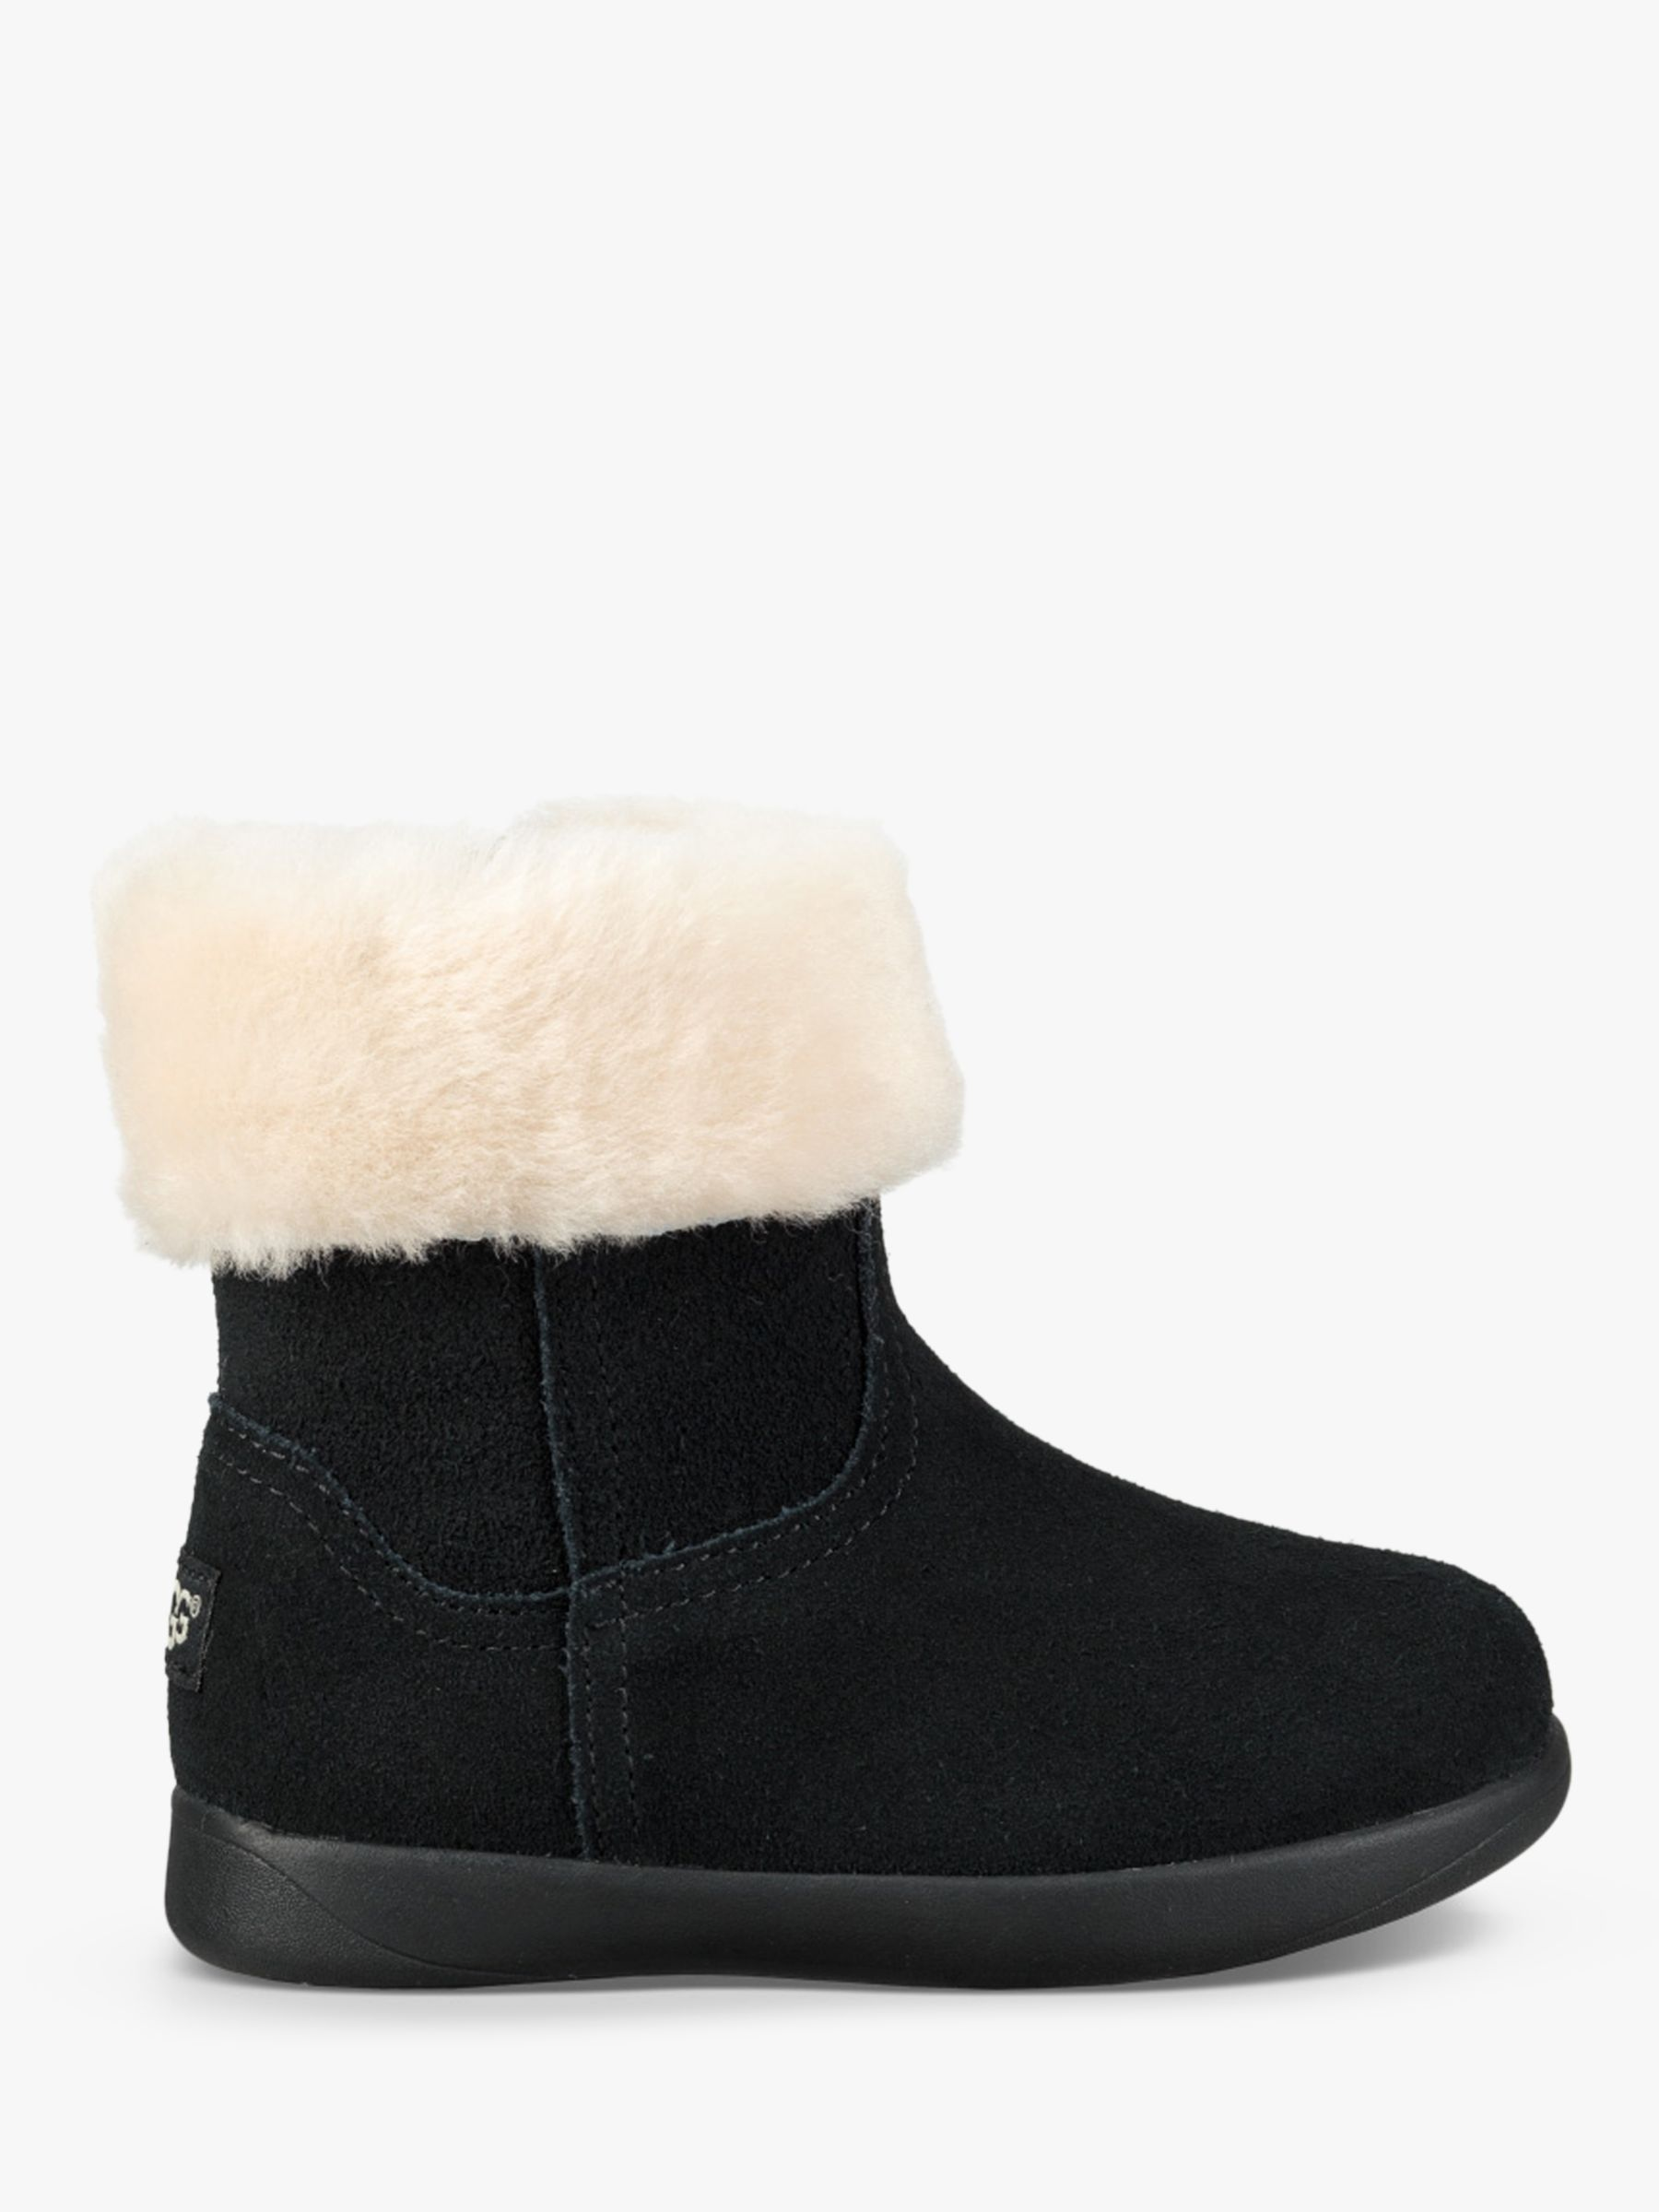 1f939b73649 UGG Children's Jorie II Boots, Black